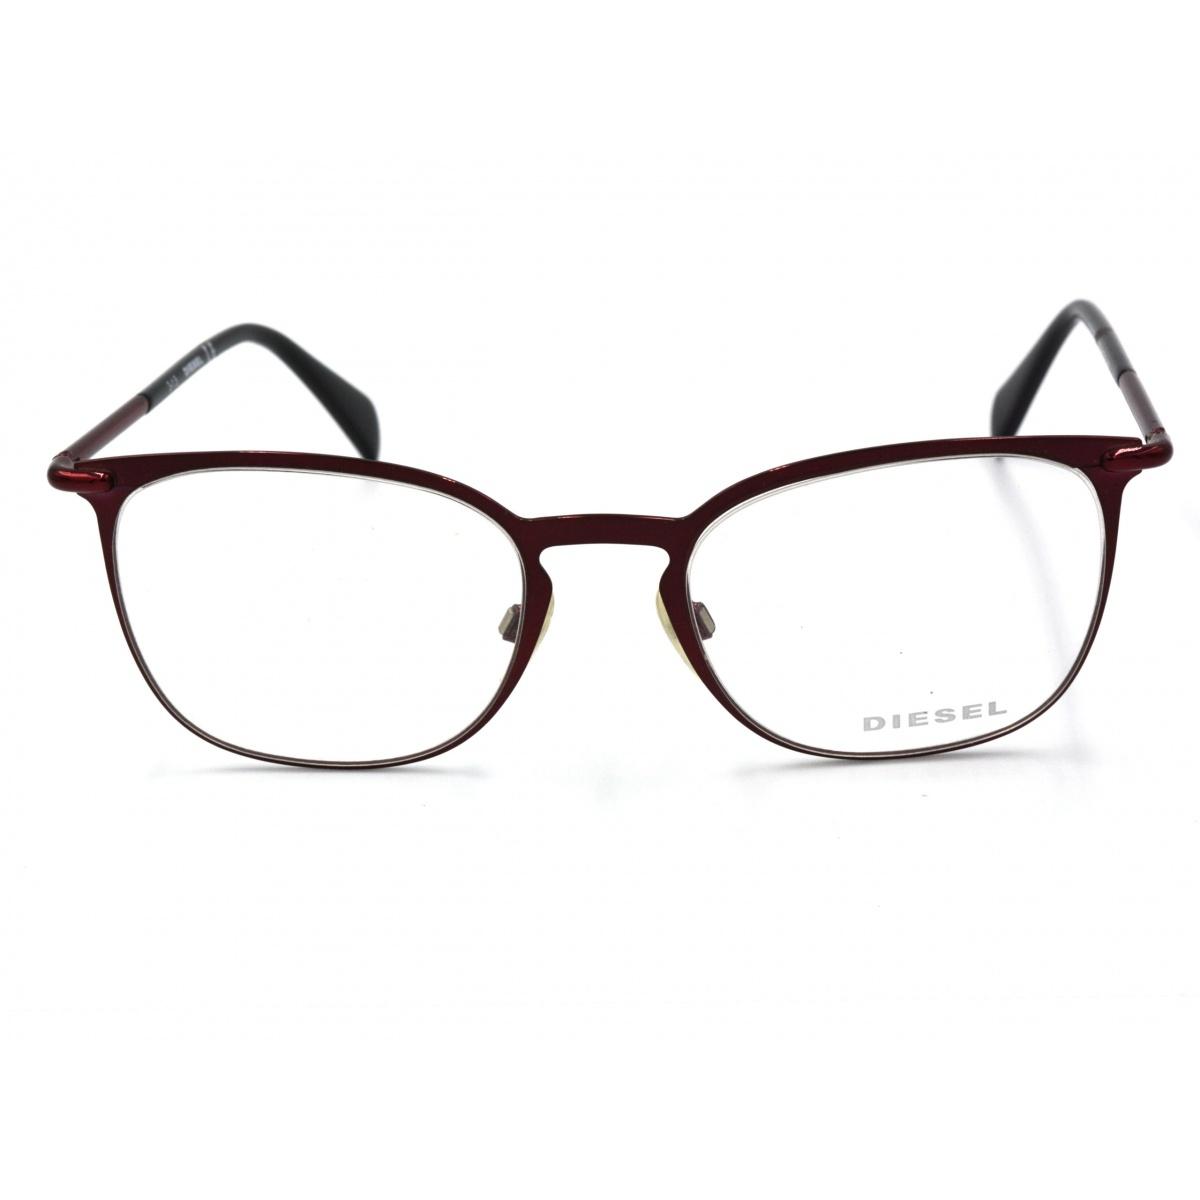 DIESEL DL5164 068 UNISEX Prescription Glasses Piraeus